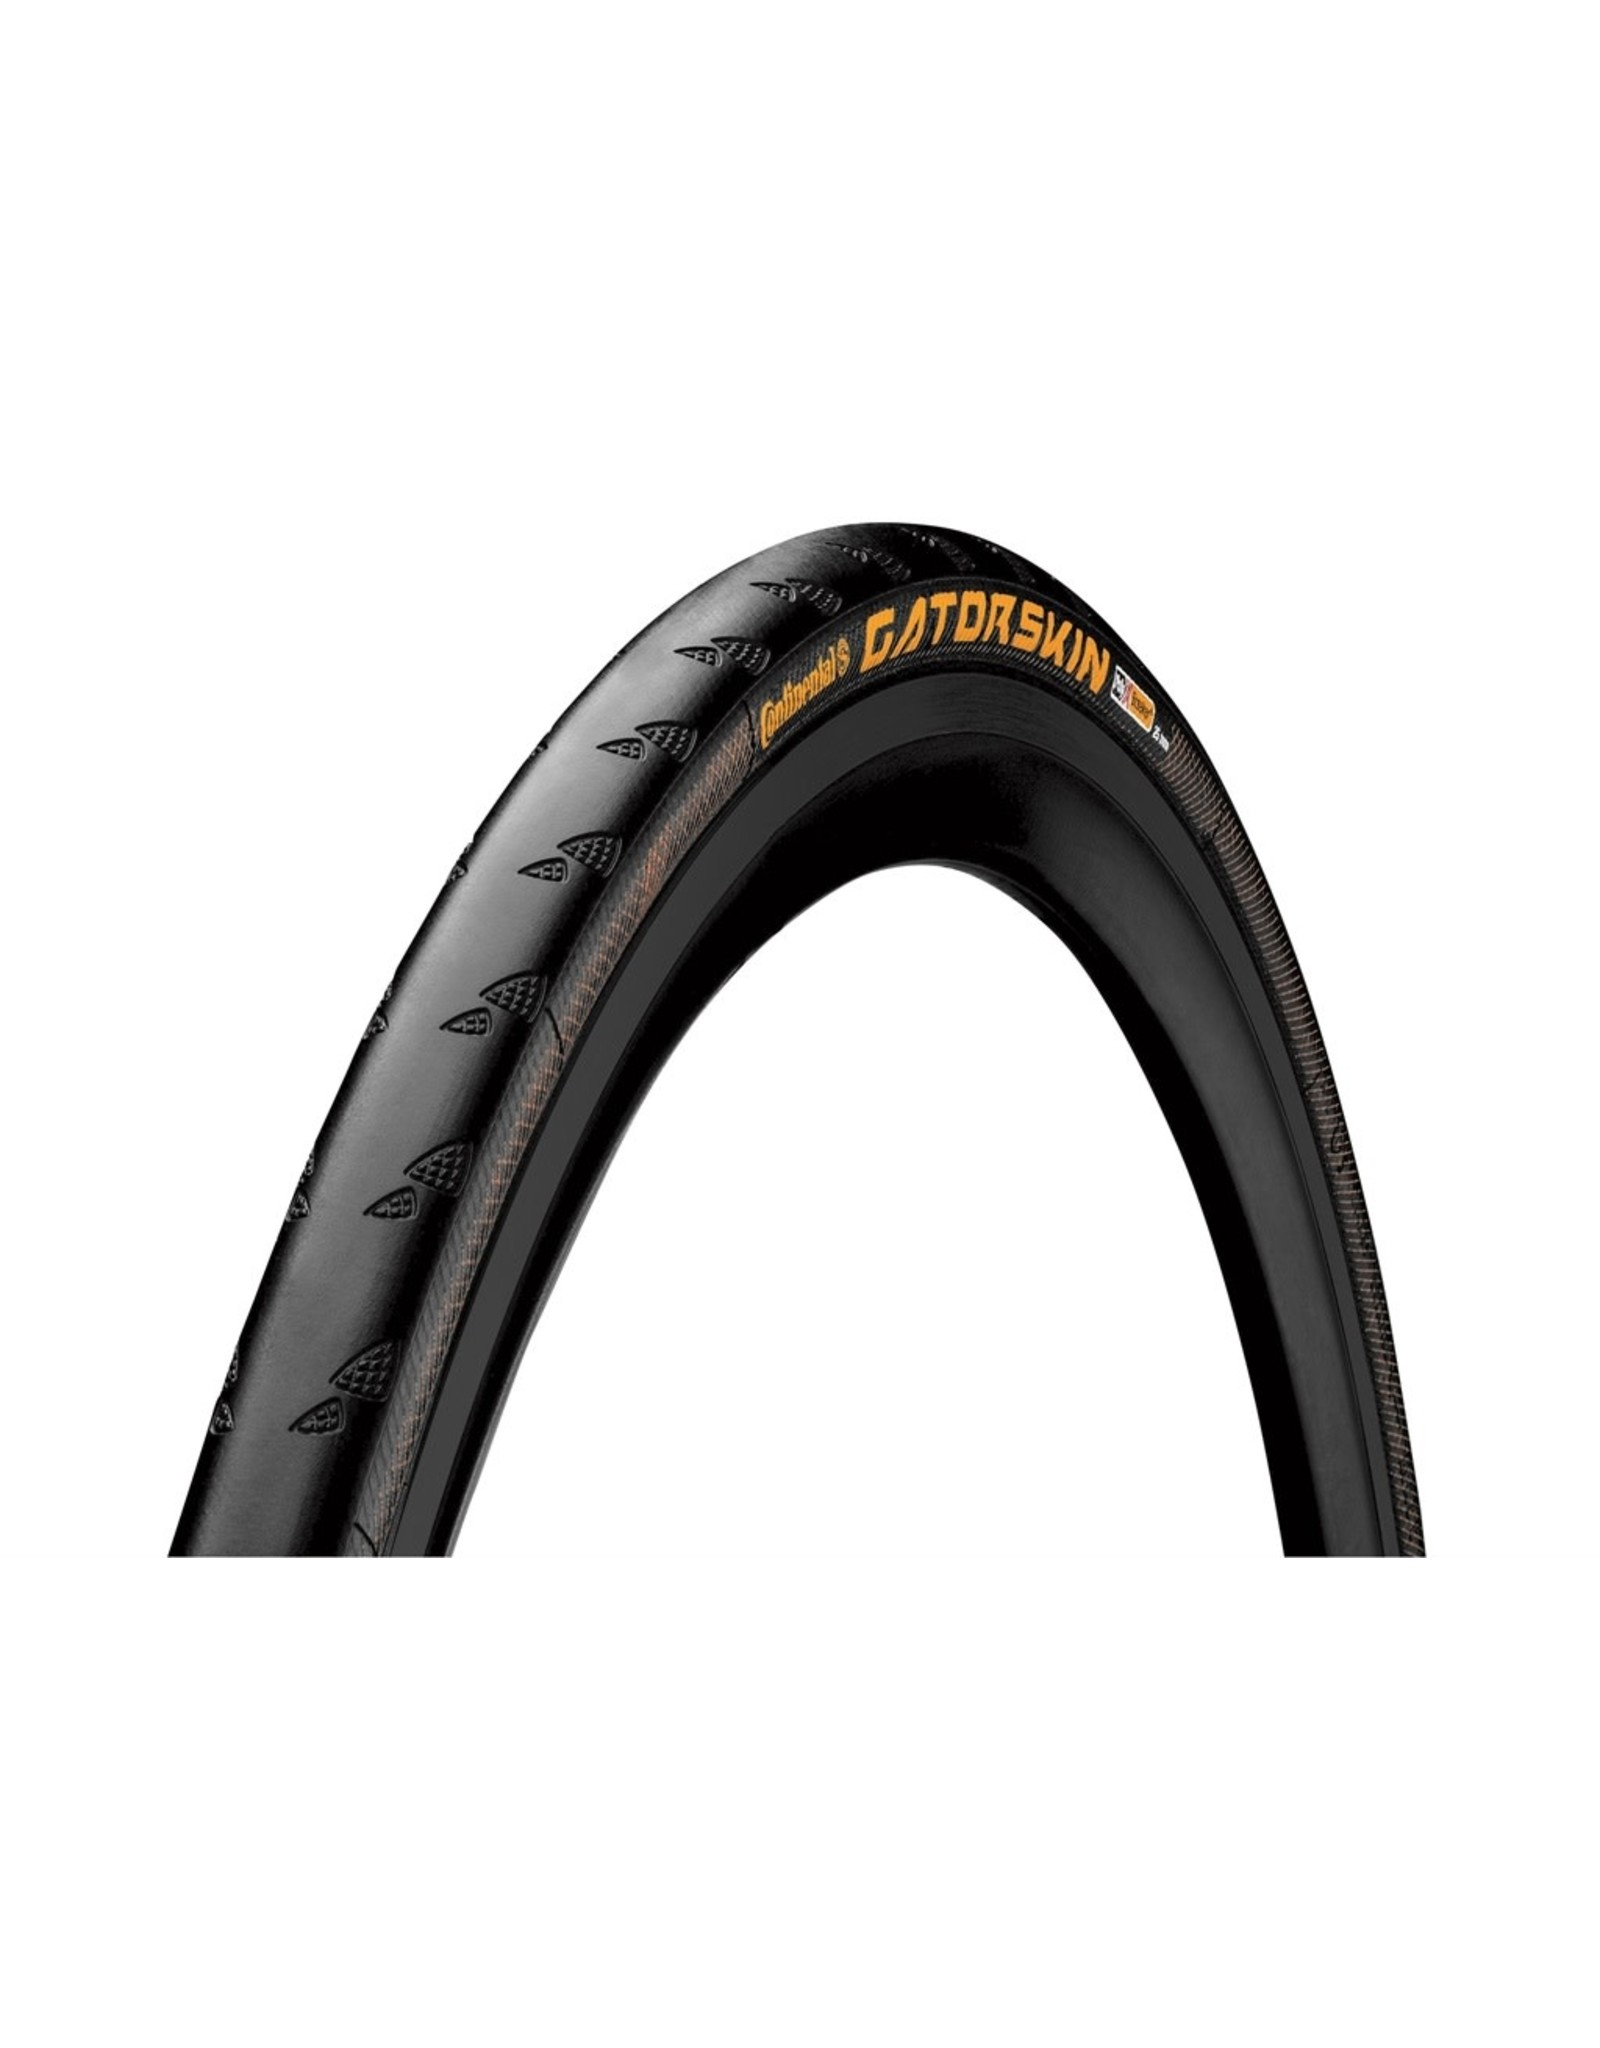 CONTINENTAL Continental - Tire - Gatorskin